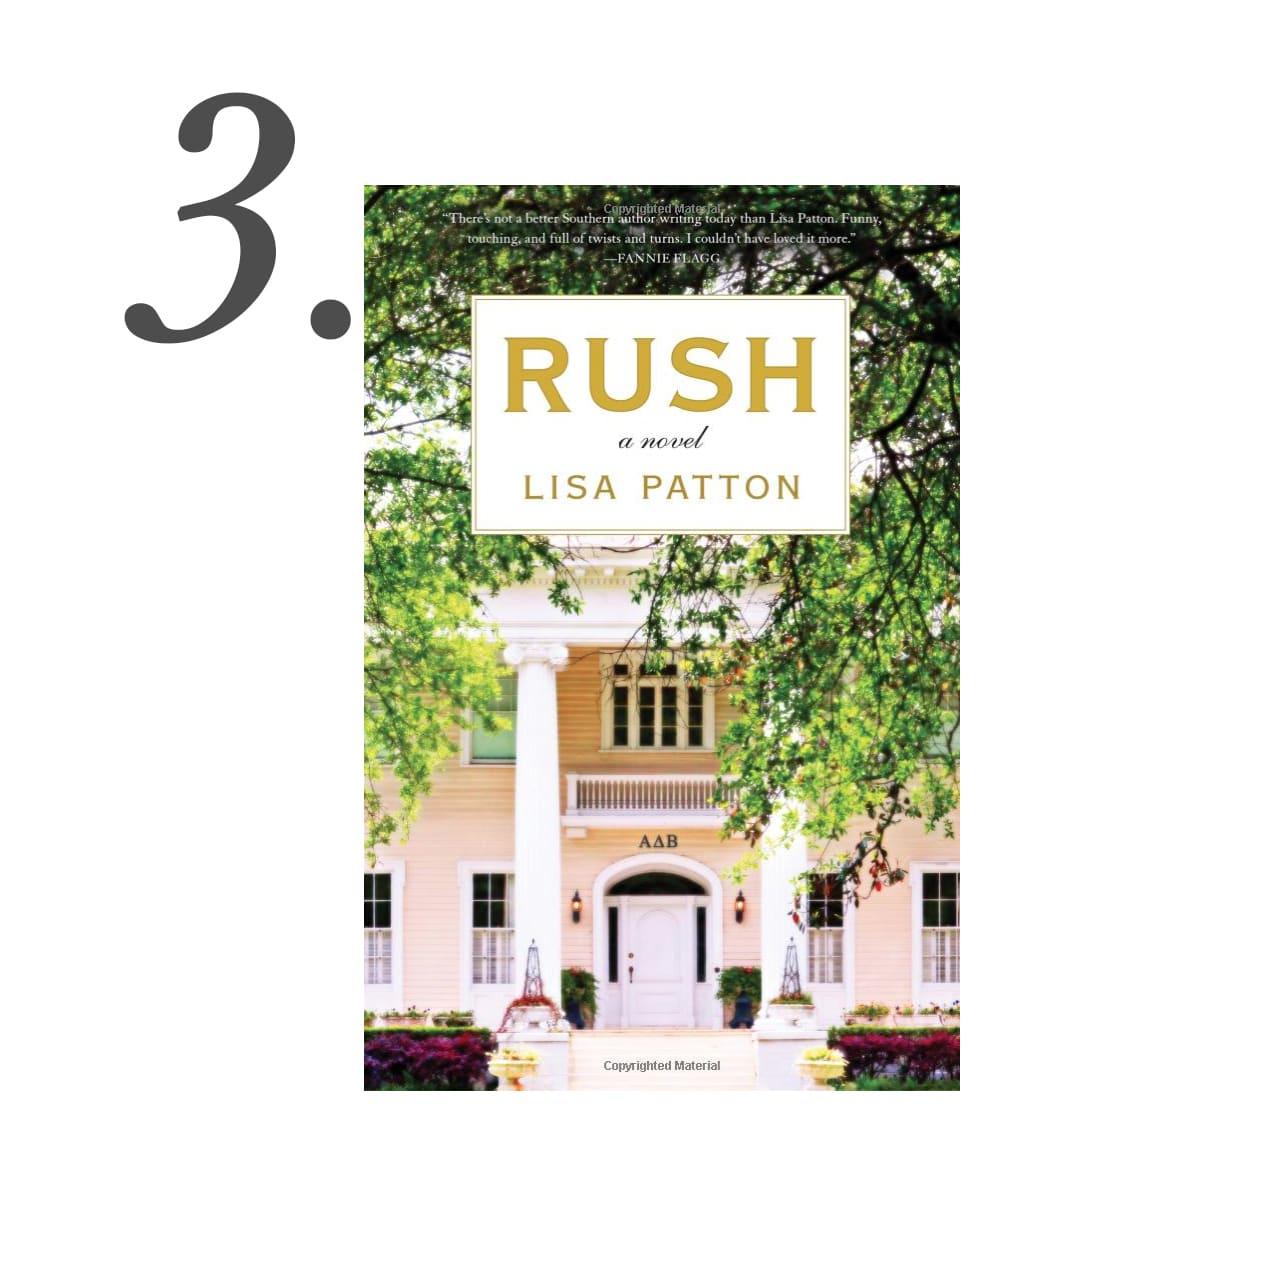 Rush- A Novel | www.ashleybrookedesigns.com